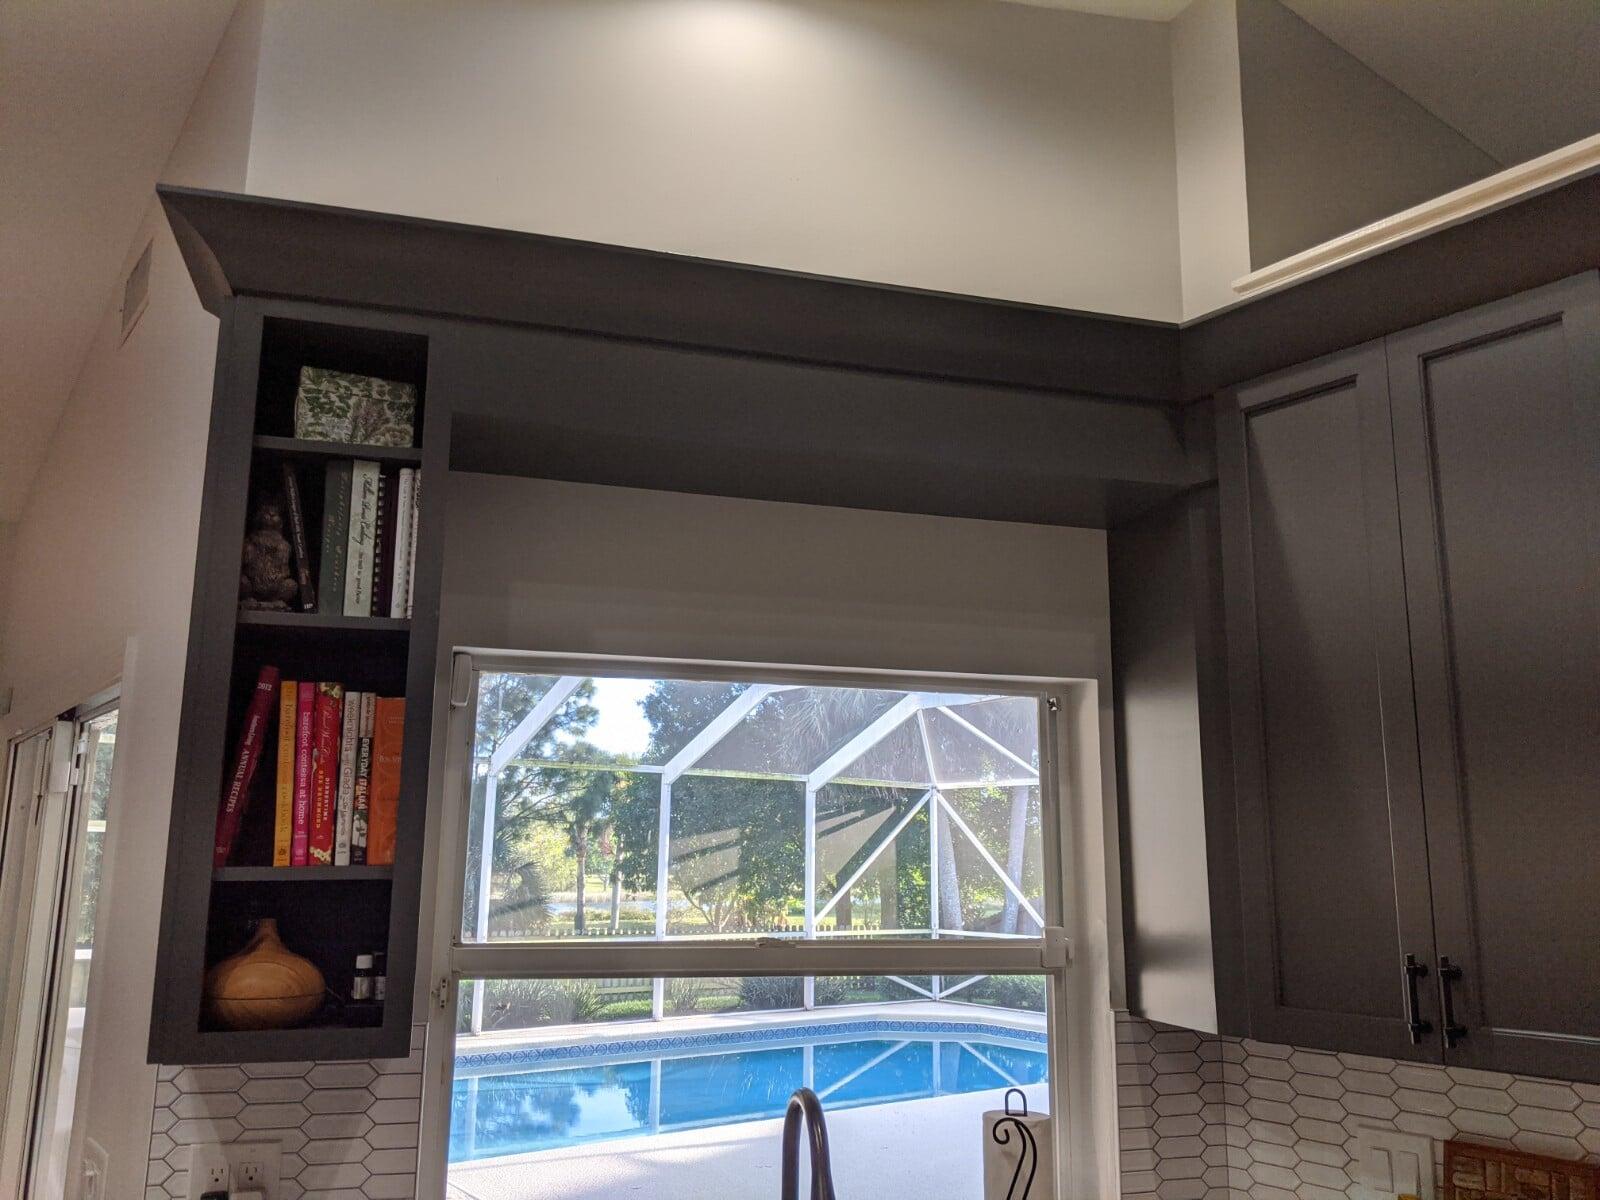 Custom cabinetry and shelving in Stuart, FL from Agler Kitchen, Bath & Floors